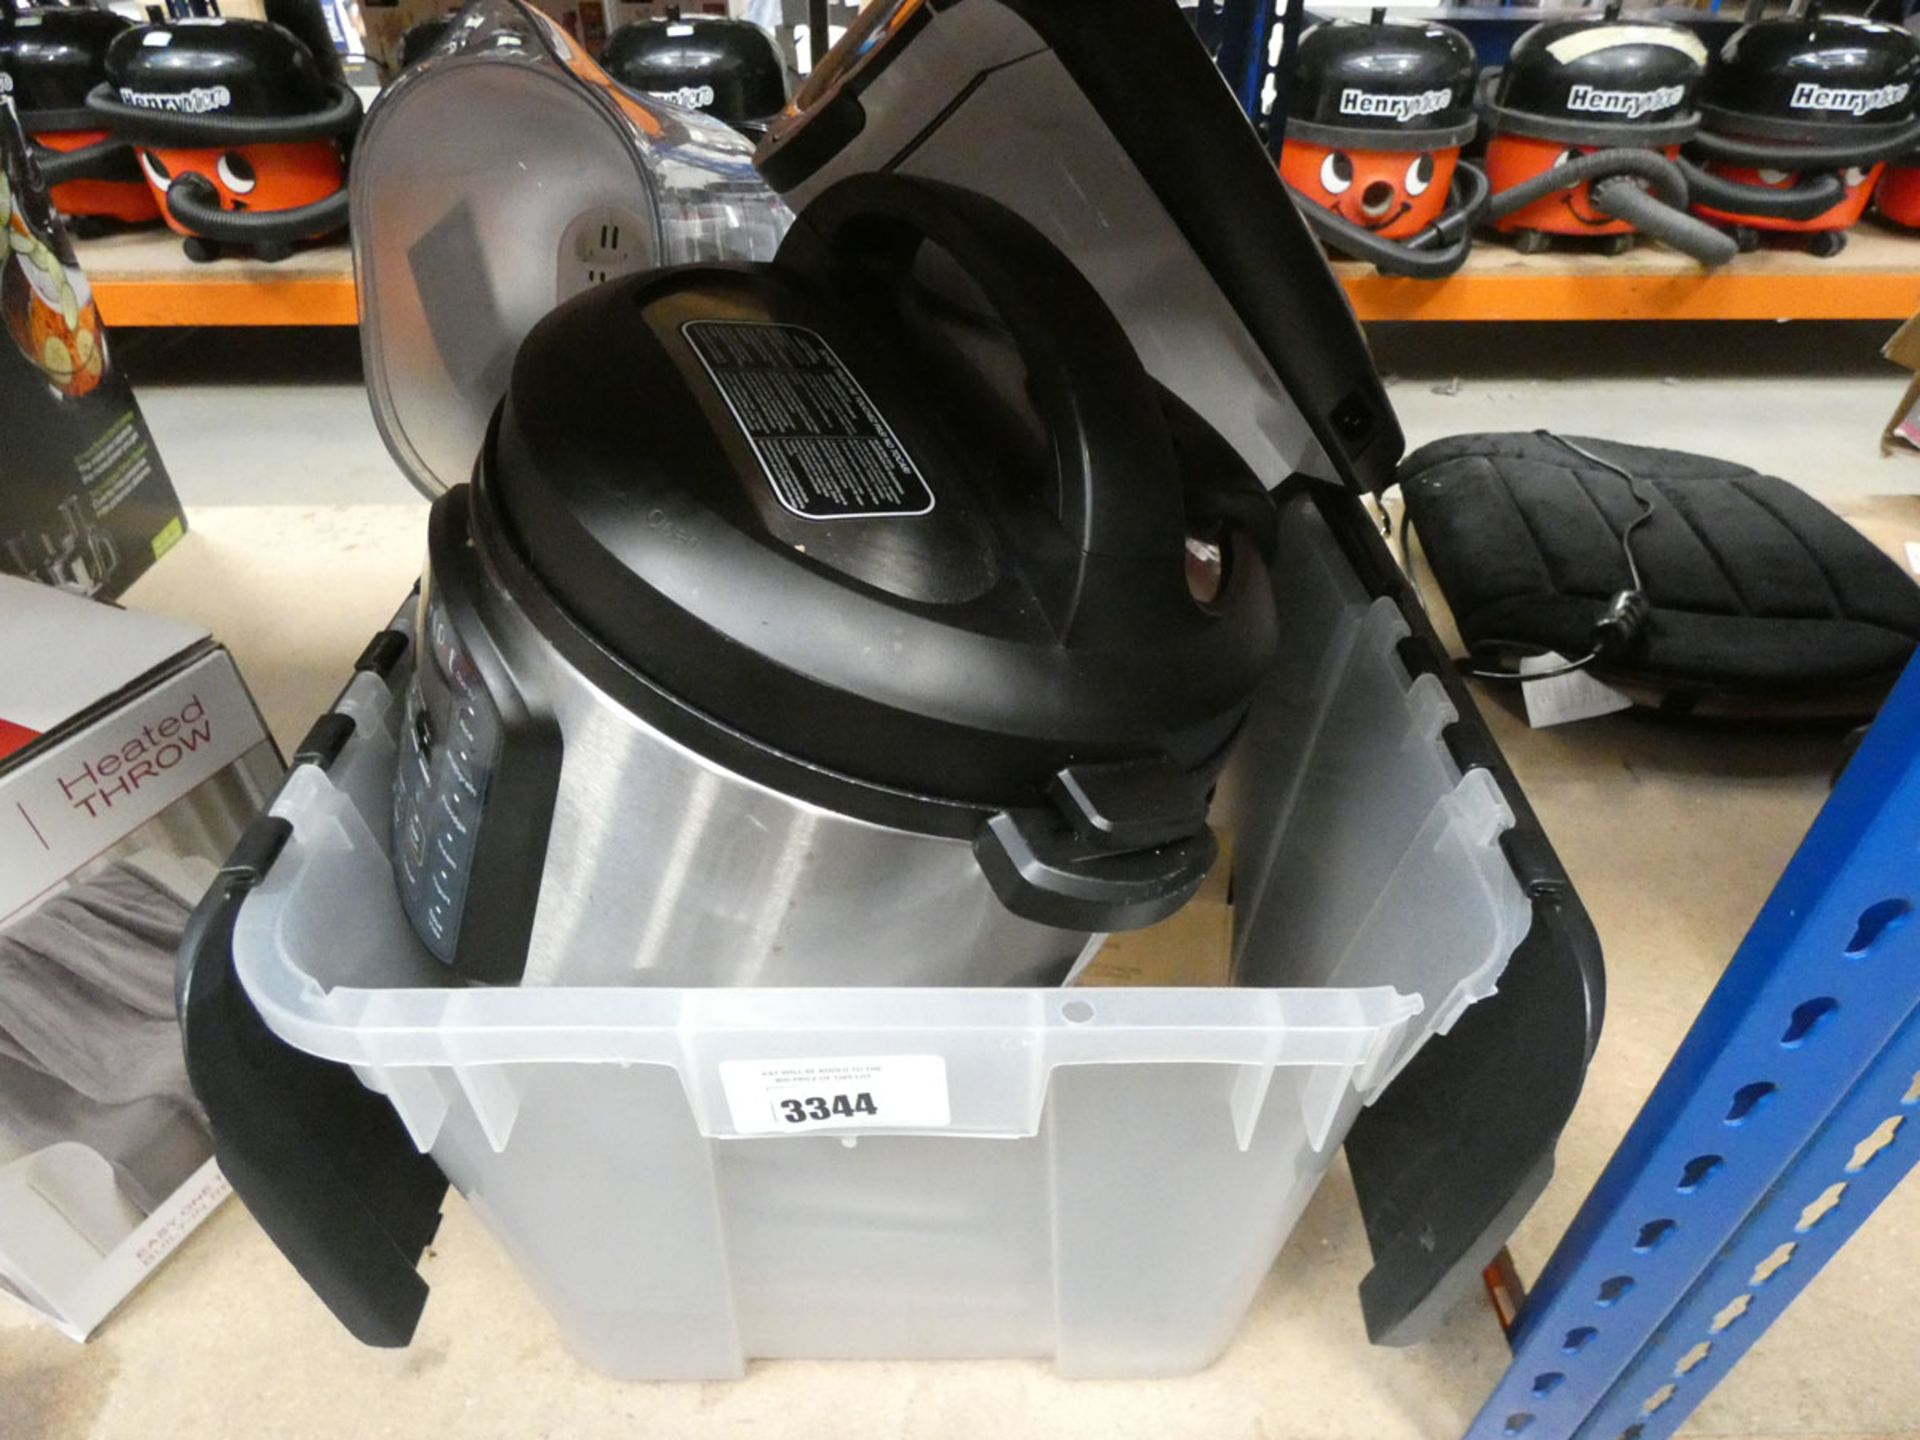 Box containing a Instant Pot, Easy soup maker, etc